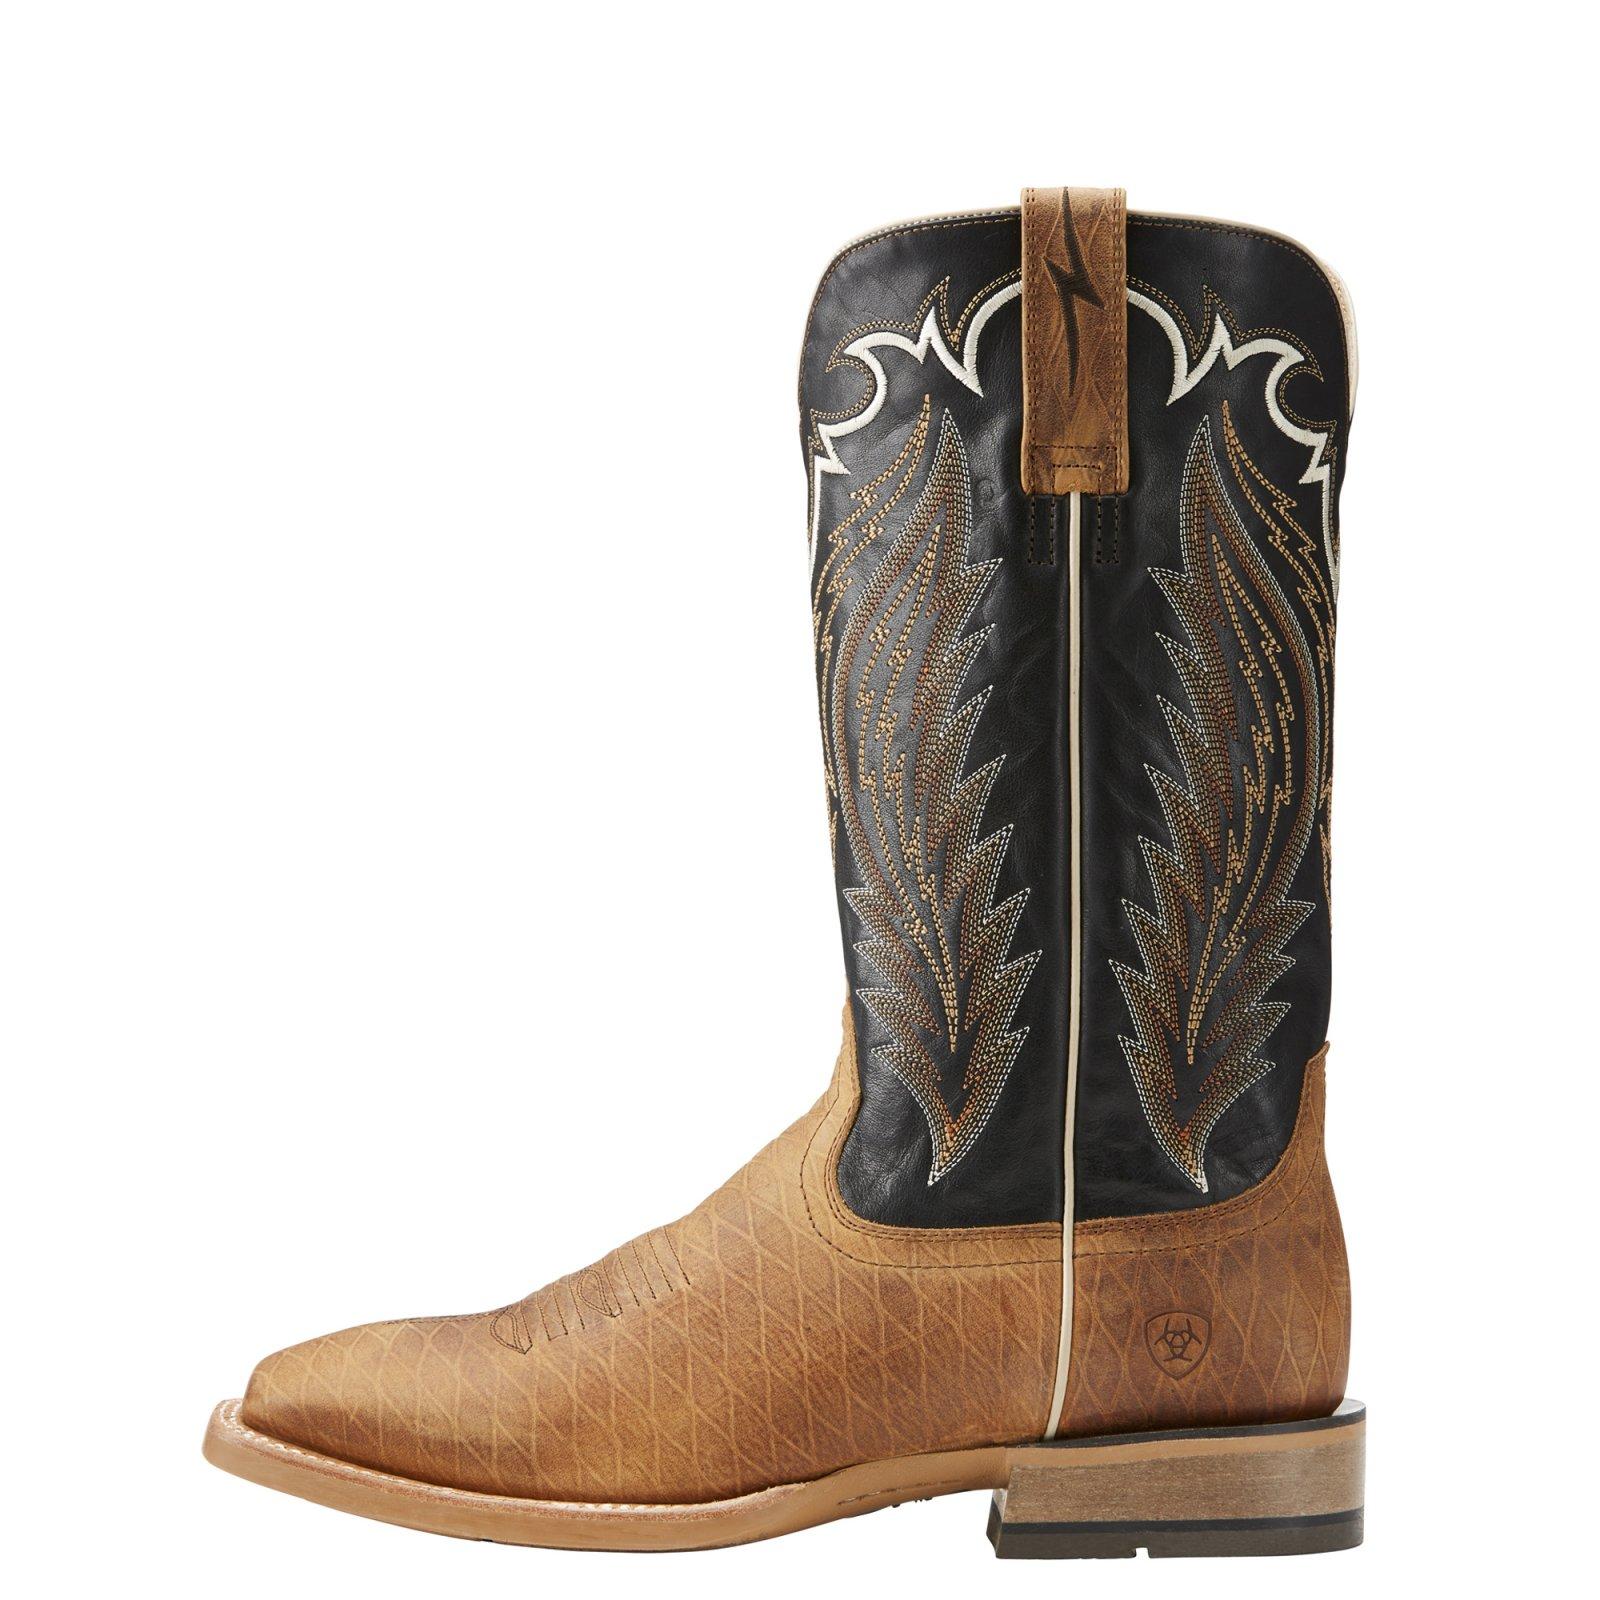 Men's Top Hand Western Boot from Ariat